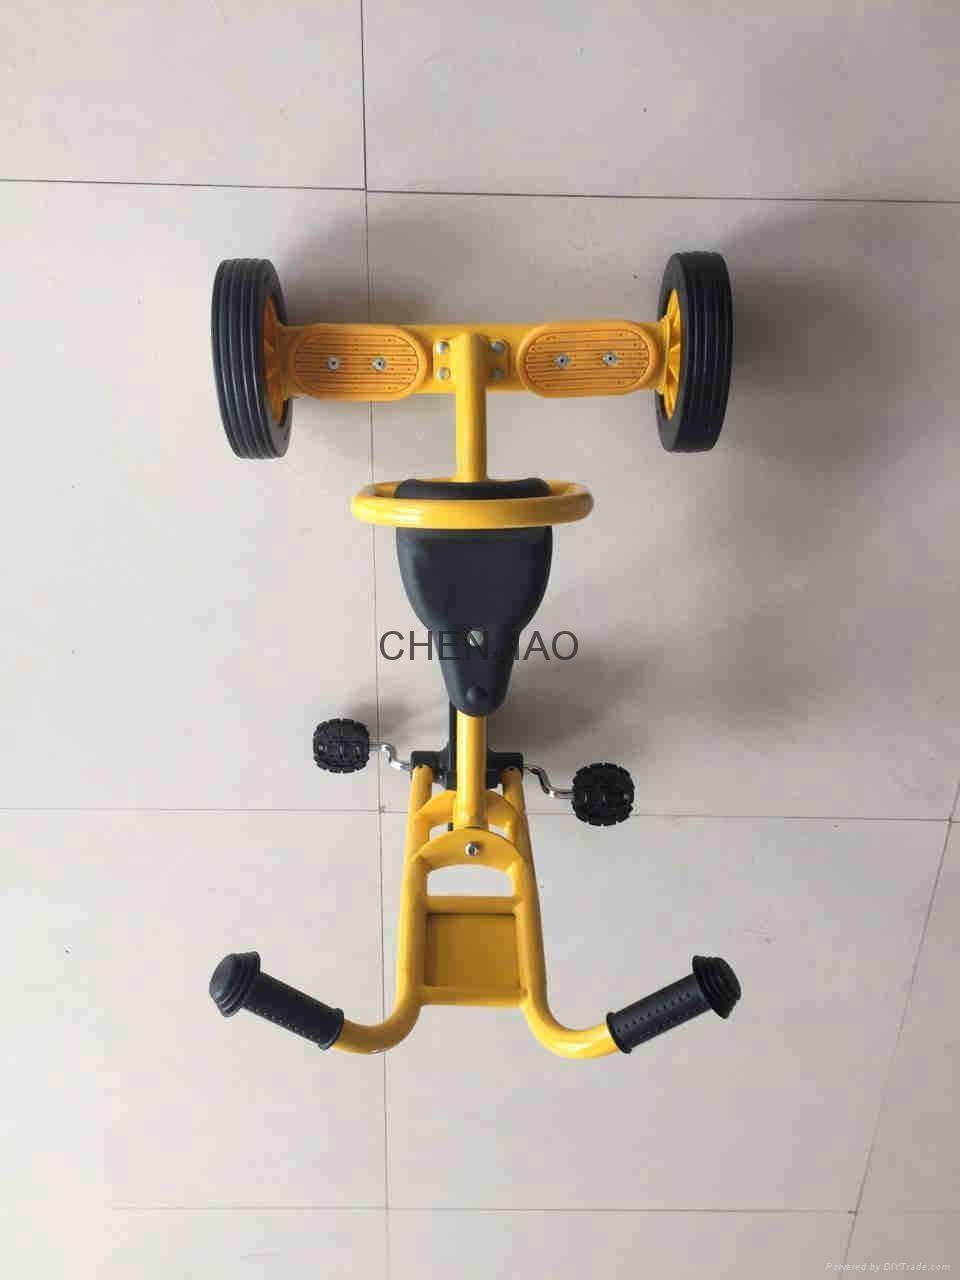 Three Wheel Balance Multiplayer Team Work Spirit Kids Bicycle 2